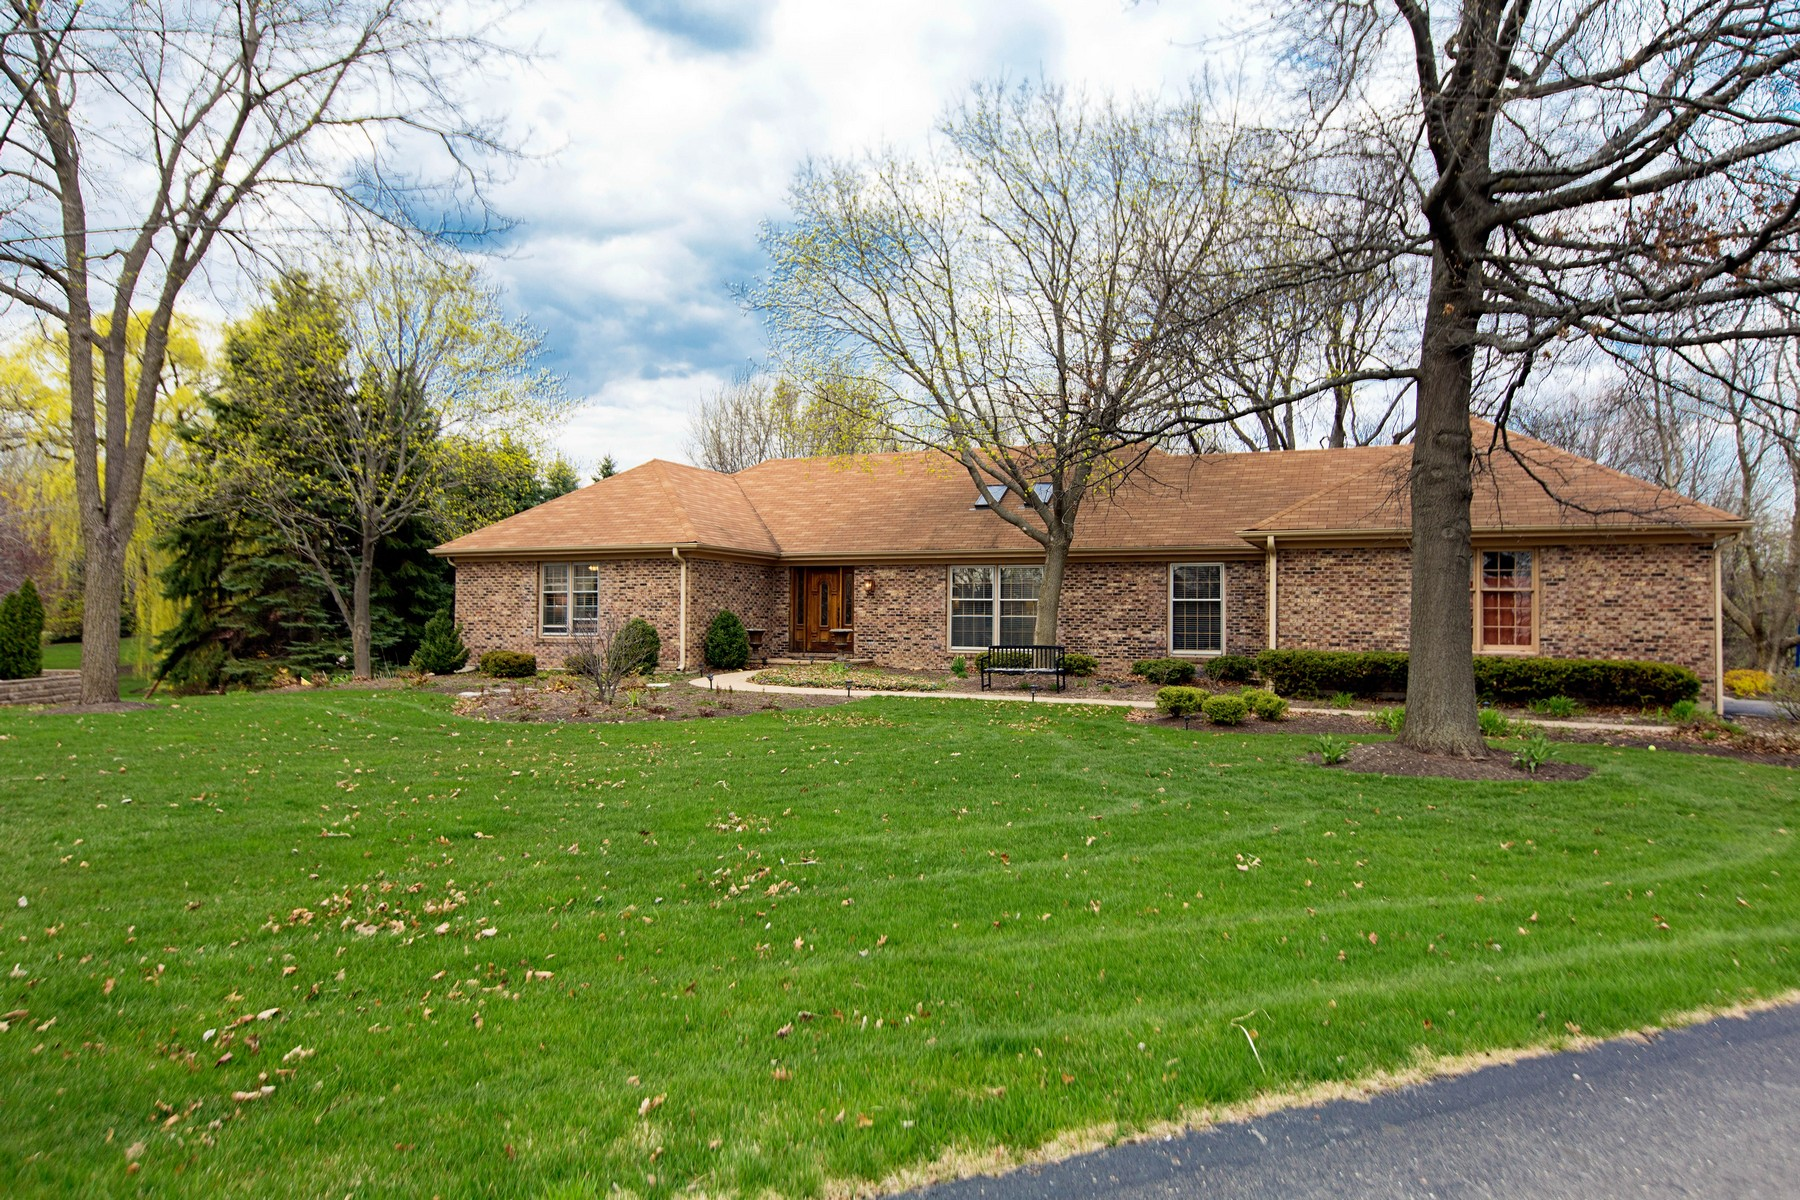 Casa para uma família para Venda às Quaint Ranch in The Coves of South Barrington 14 Turning Shore Drive South Barrington, Illinois, 60010 Estados Unidos